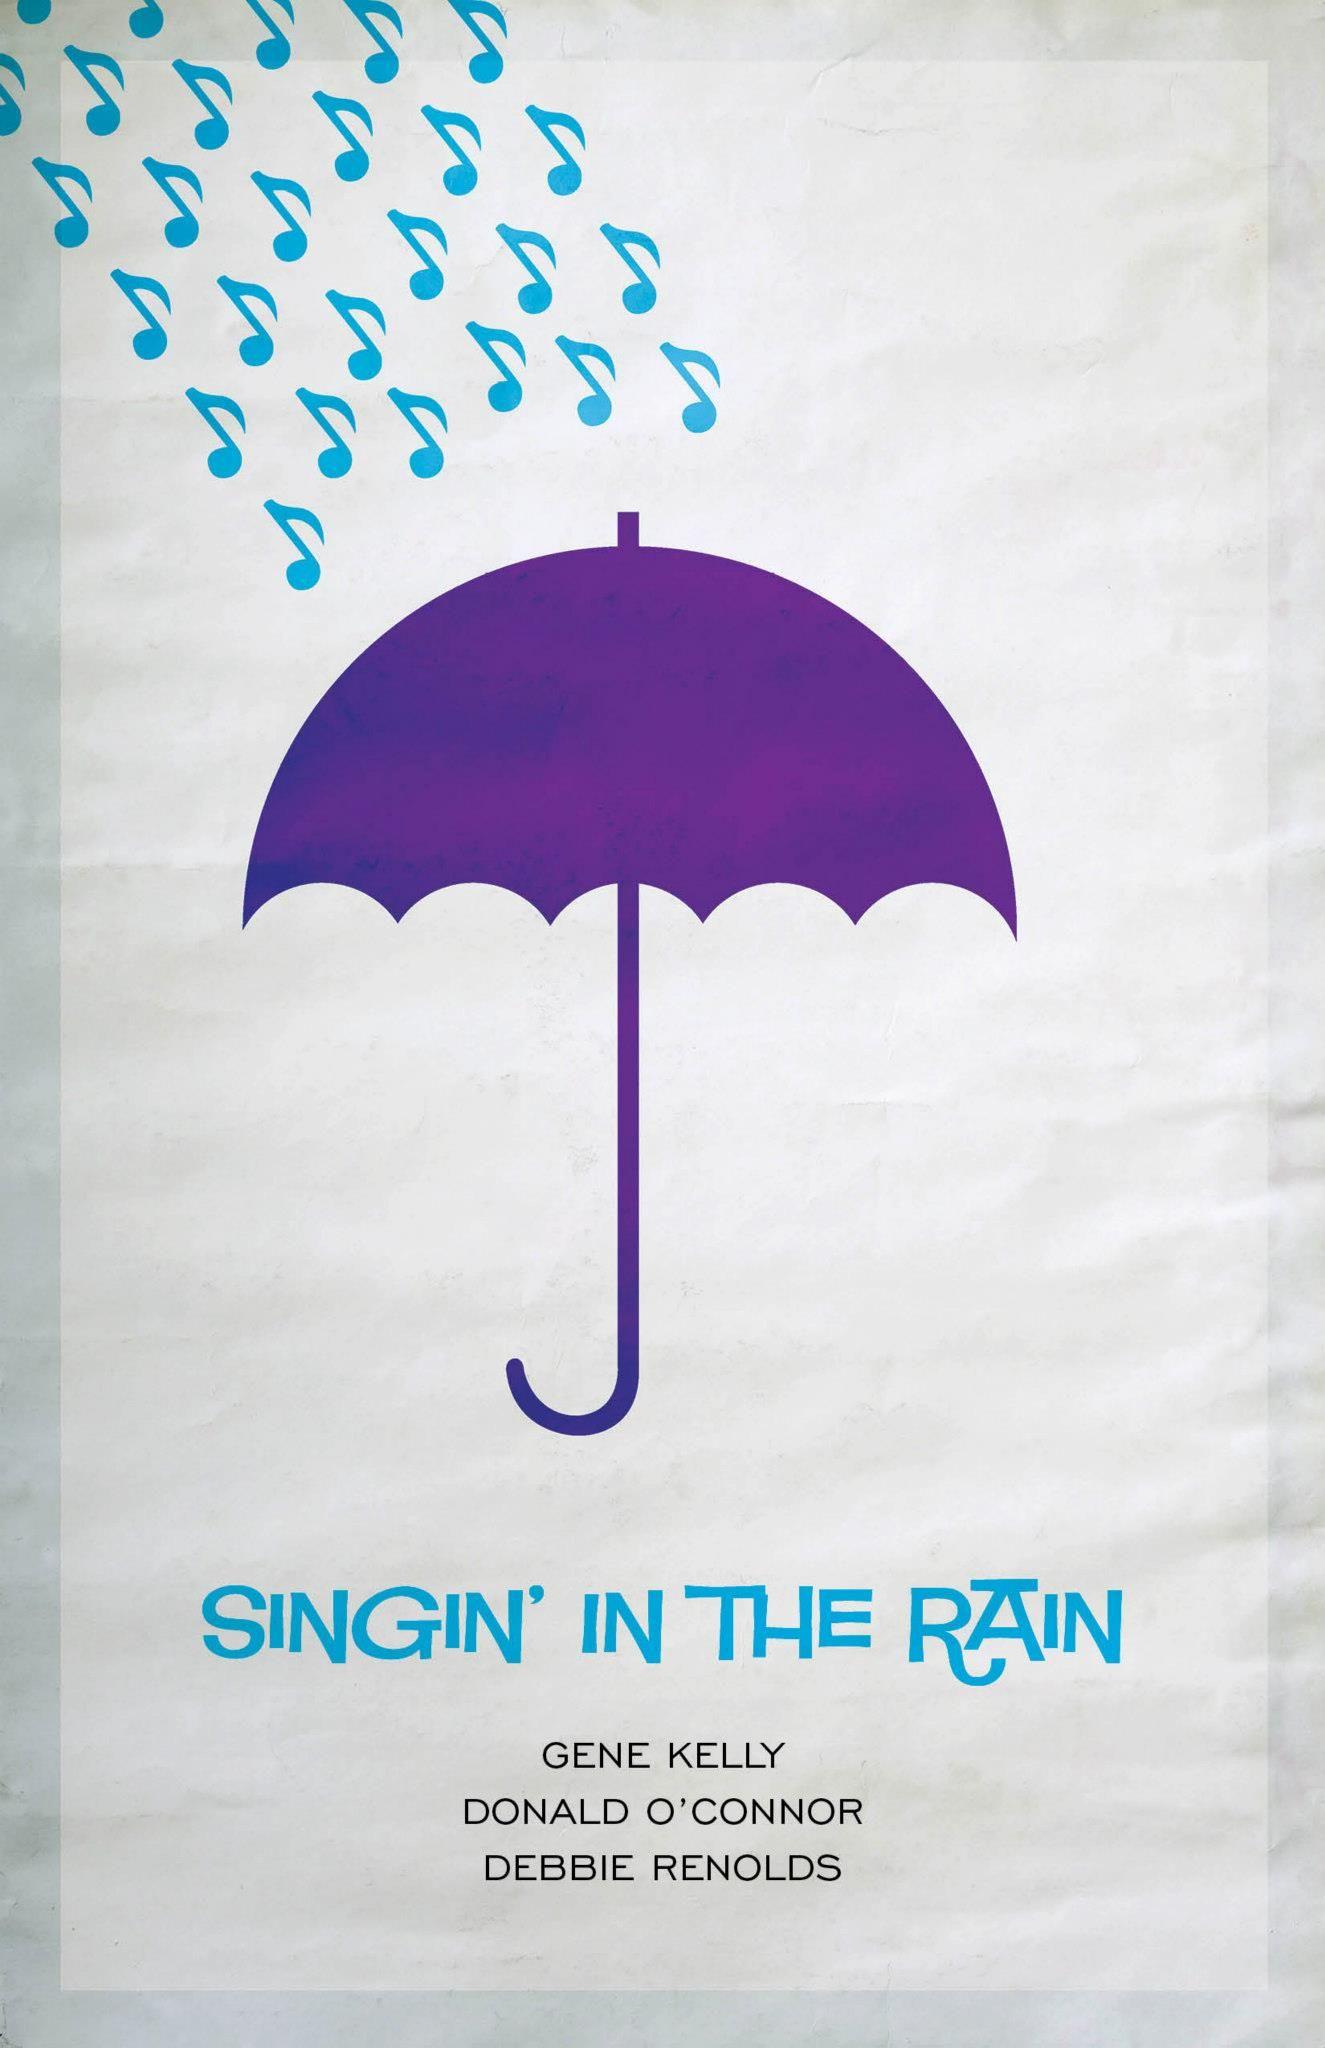 singing in the rain minimalistic movie posters film